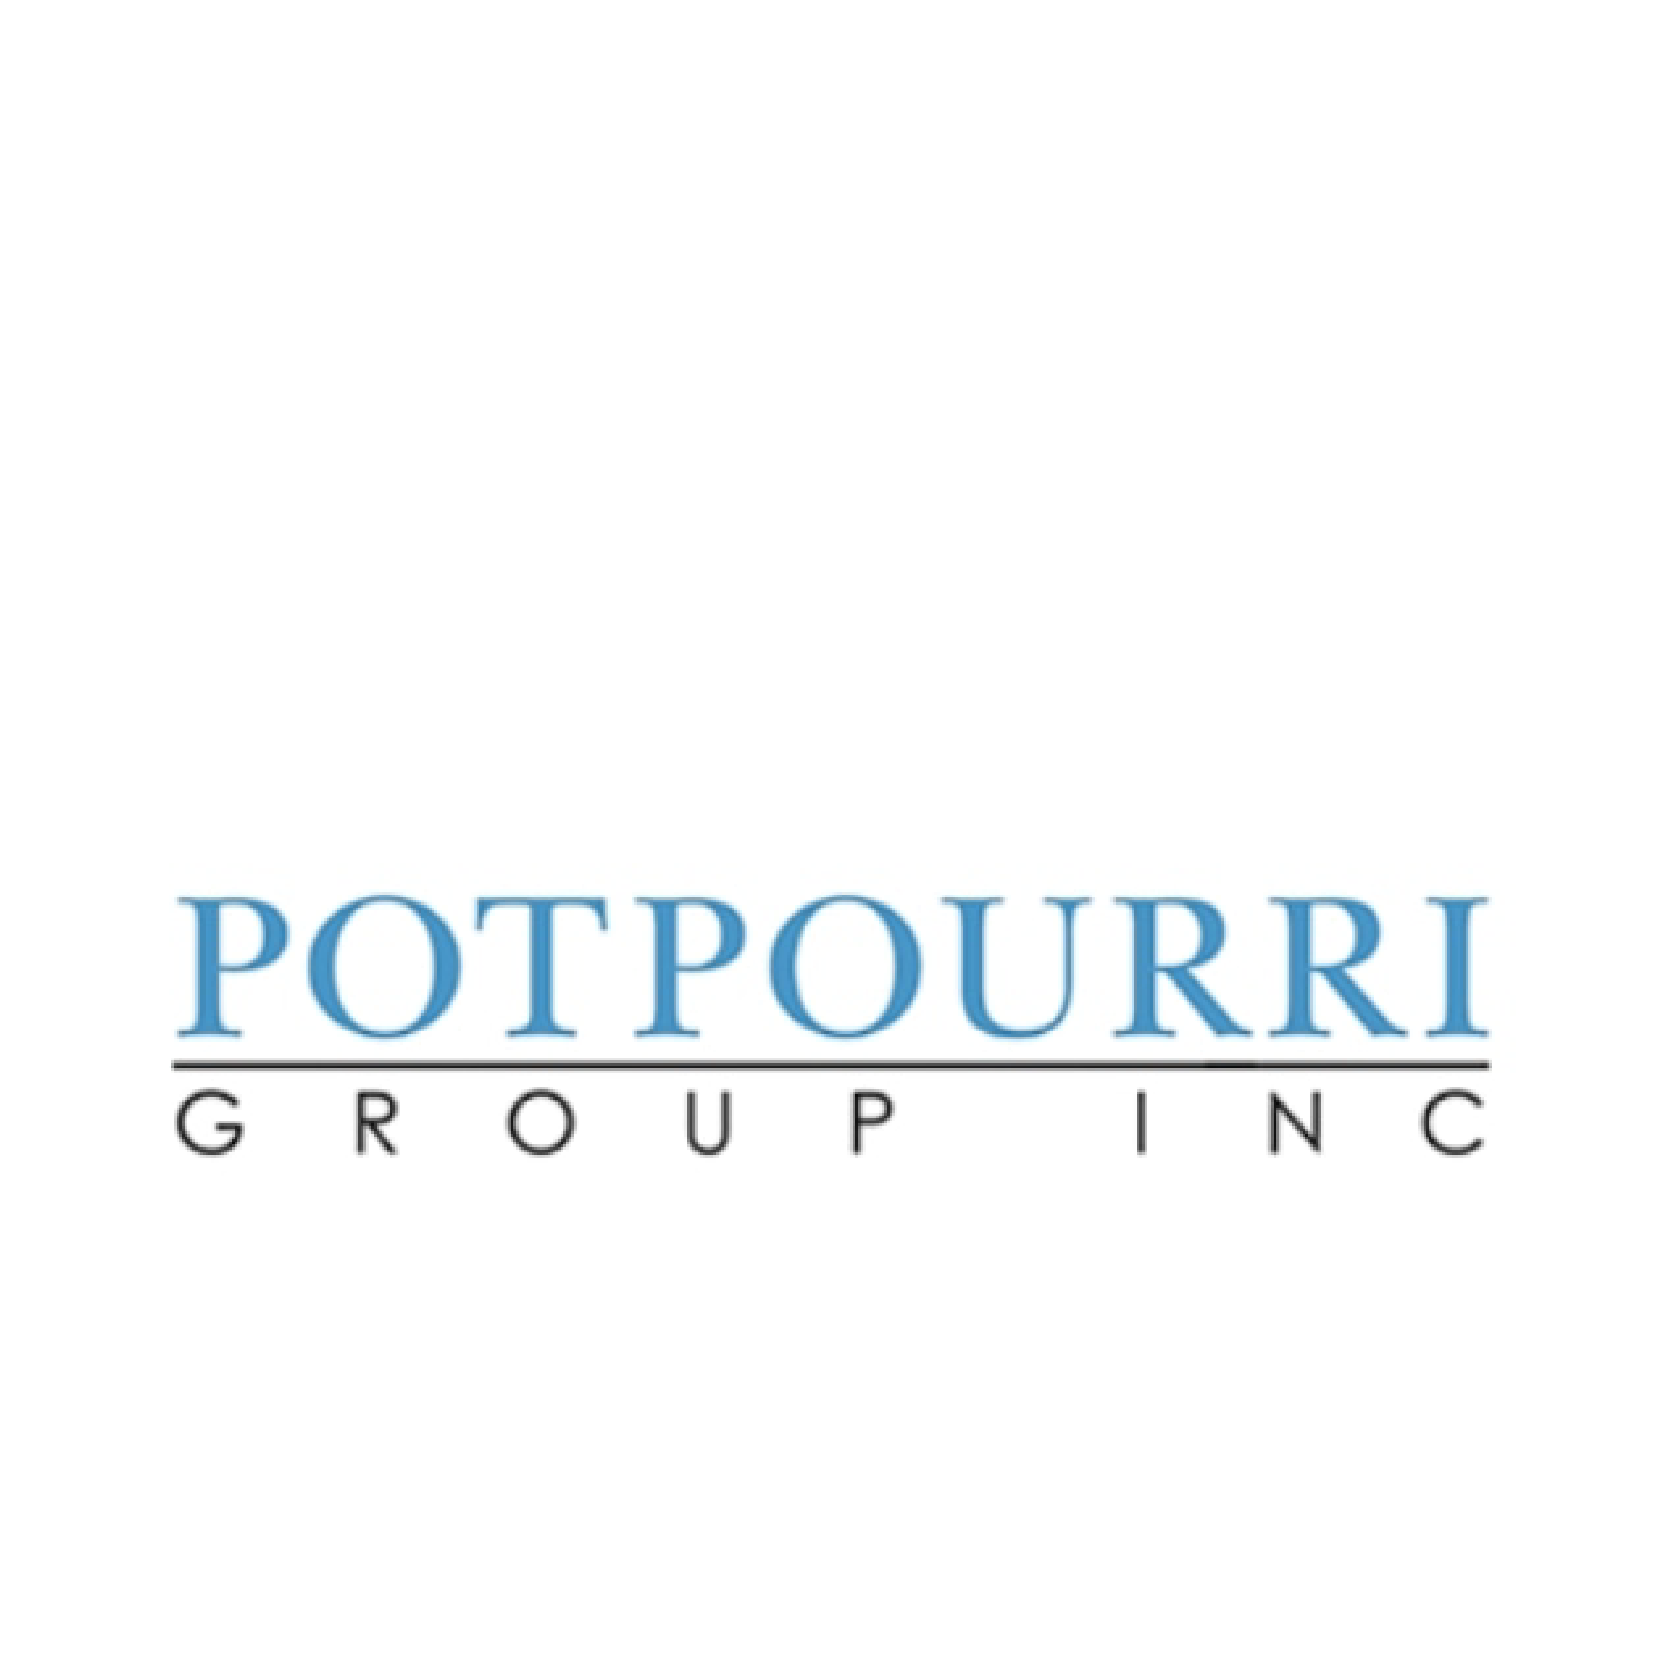 Popourri Group Inc Logo